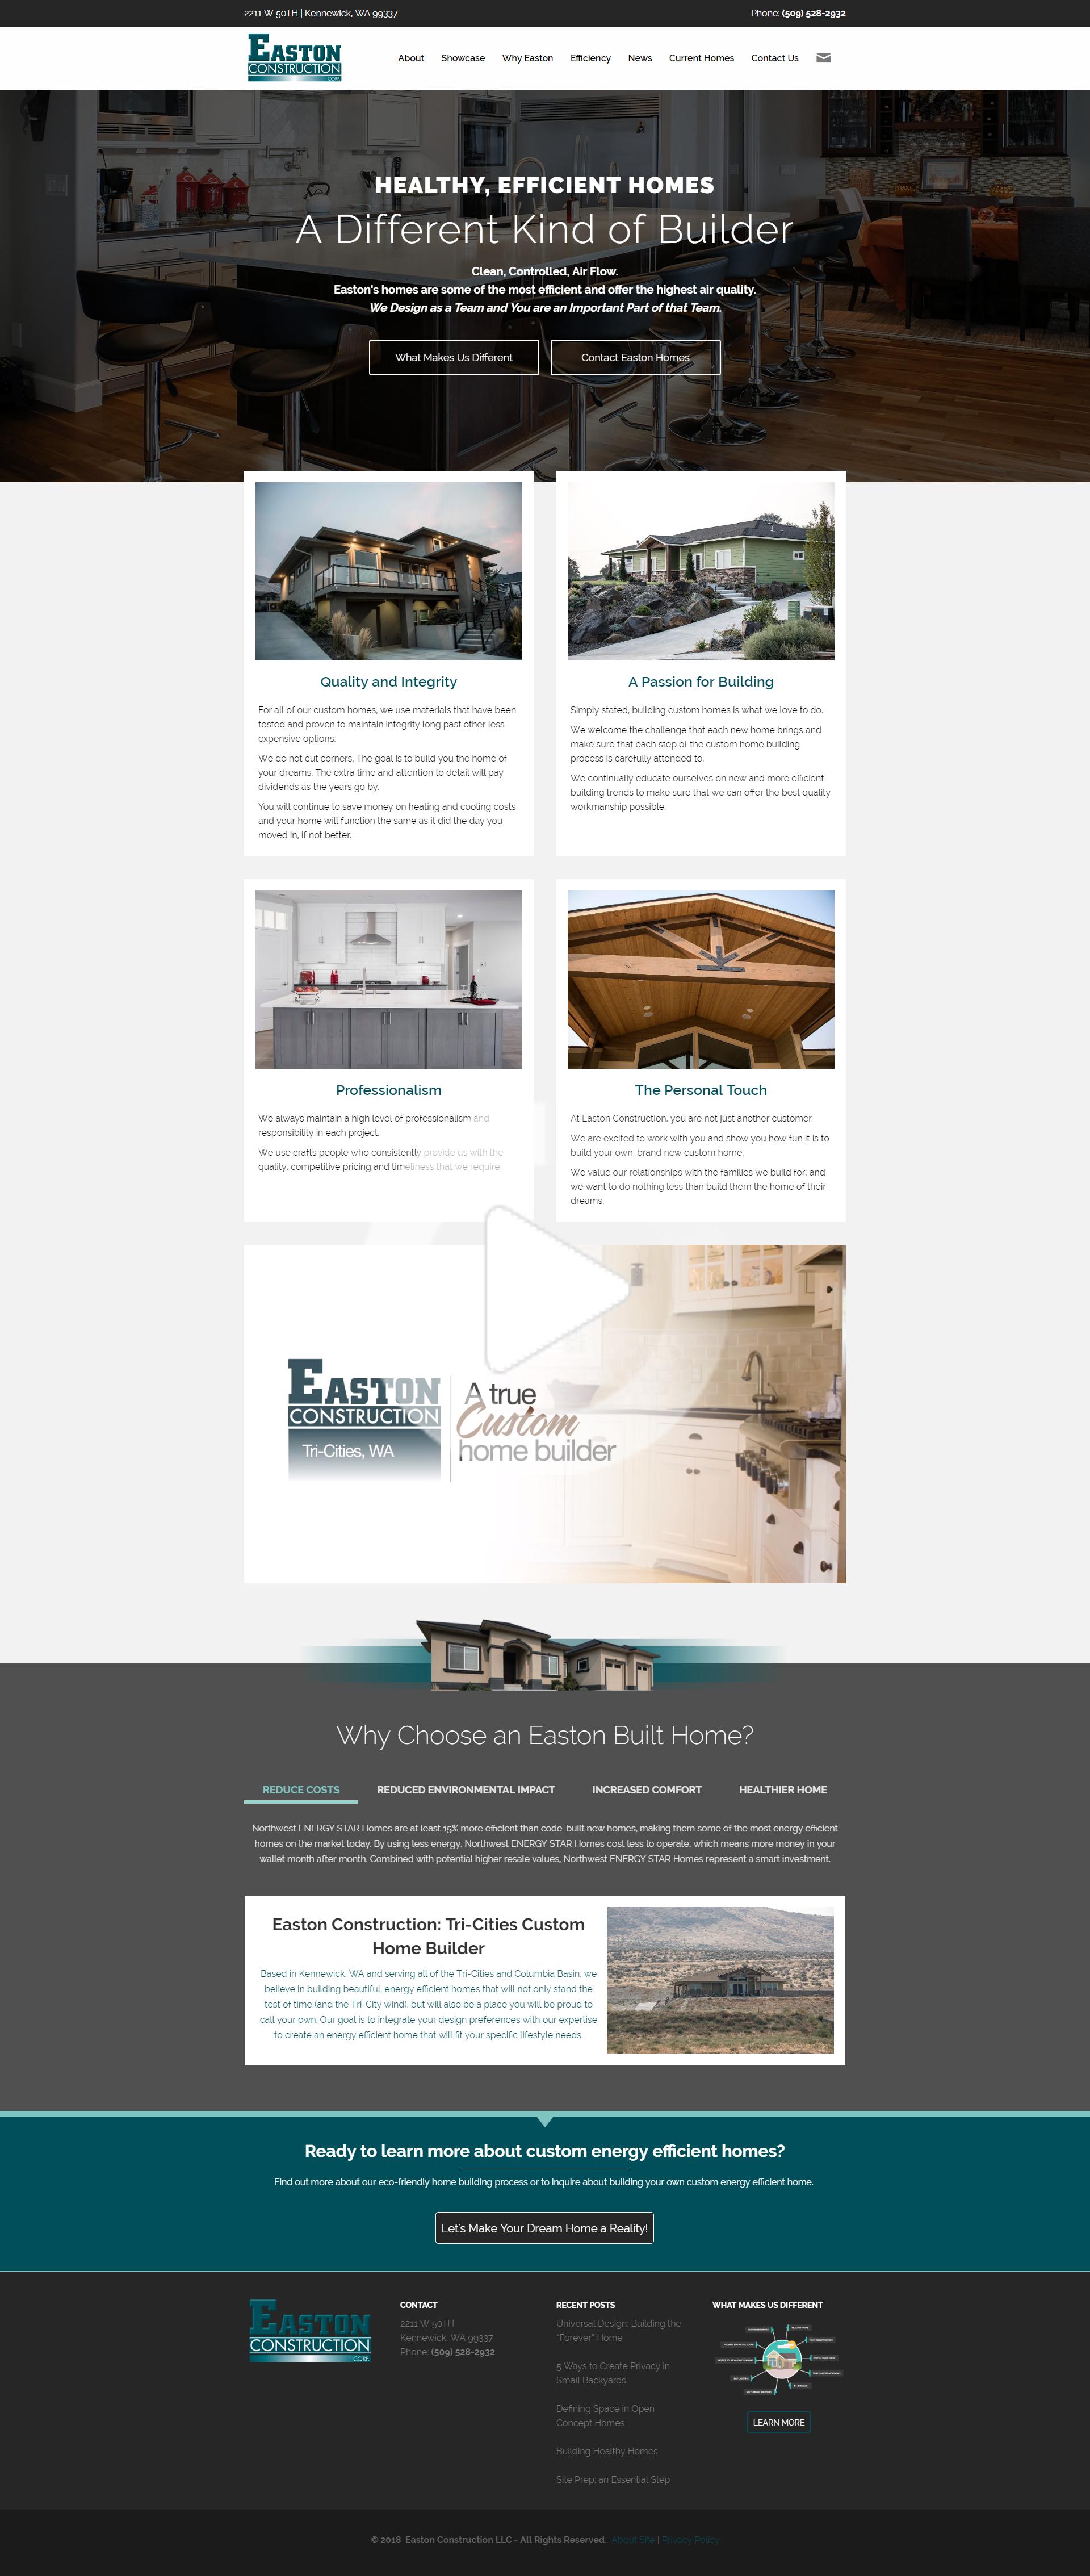 Construction Website Design In 2020 Real Estate Website Design Digital Marketing Design Portfolio Web Design